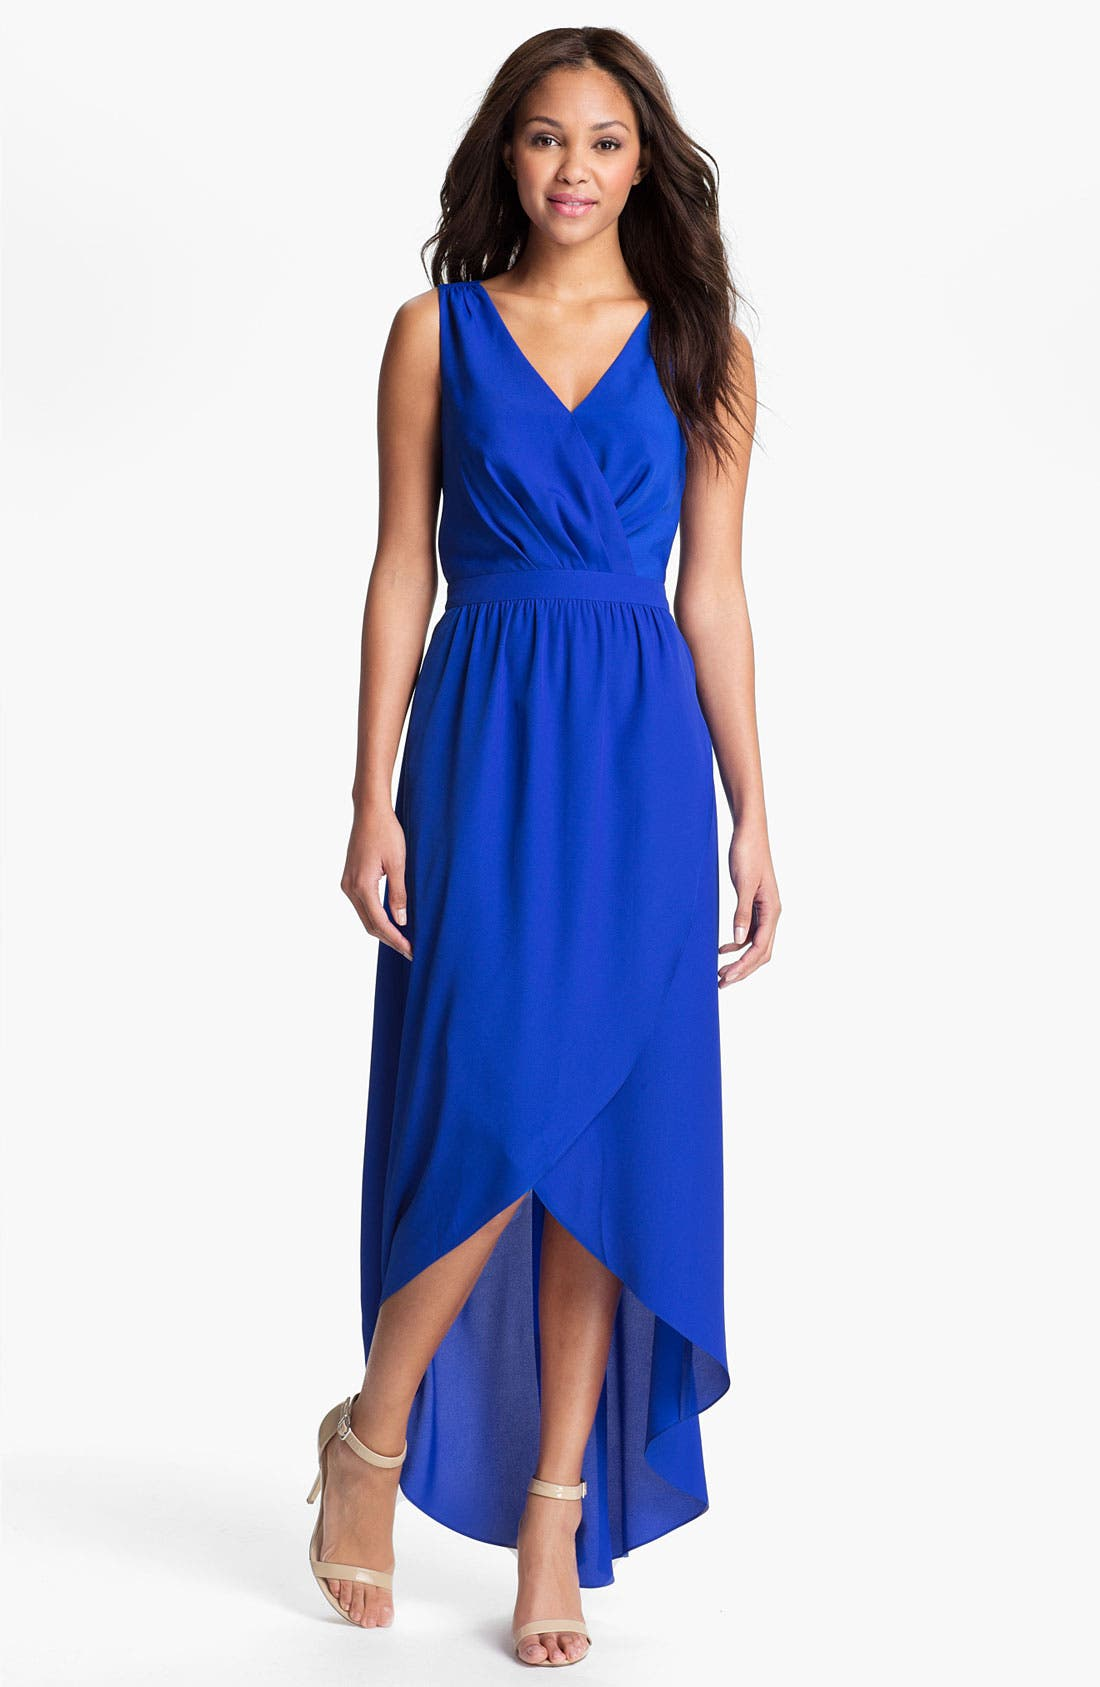 Main Image - Presley Skye Lace Up High/Low Maxi Dress